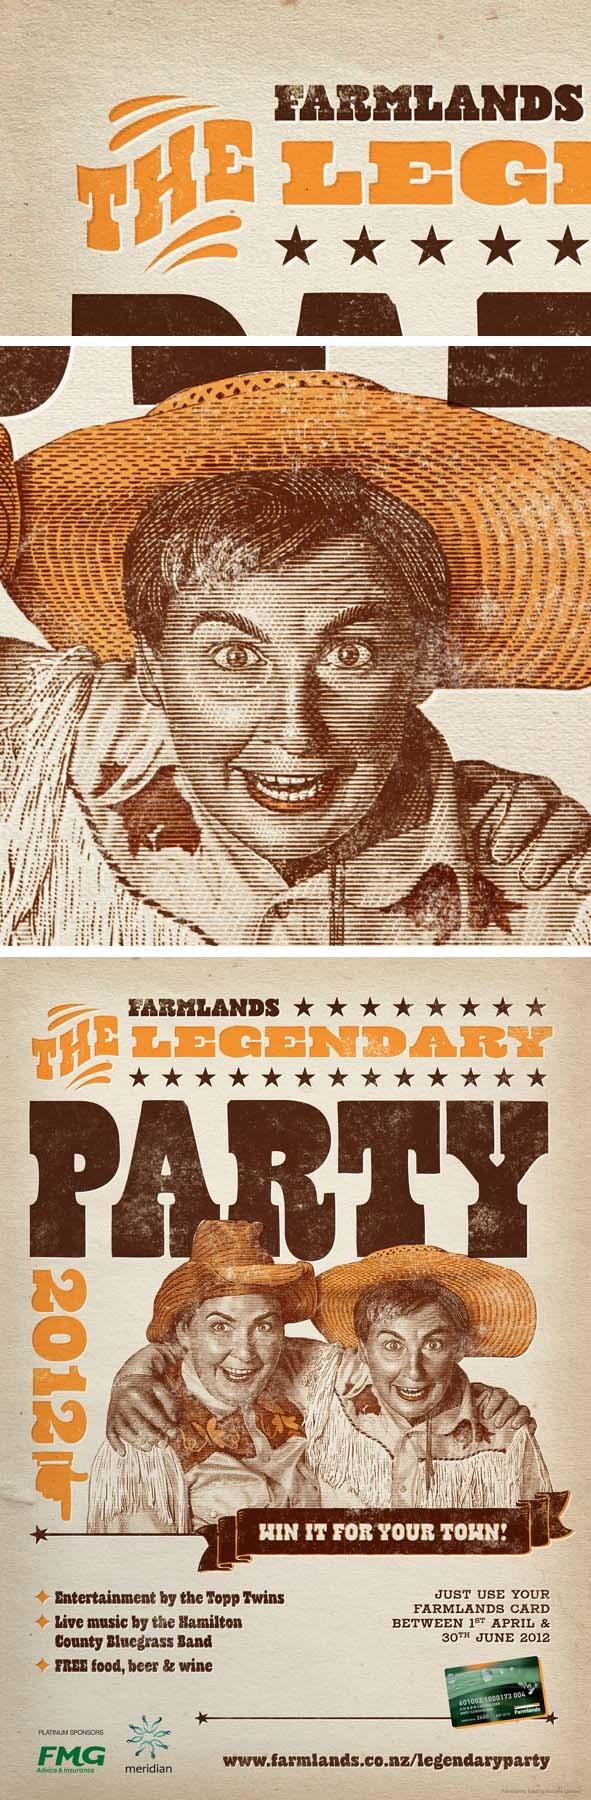 Farmlands Legendary Party 2012.